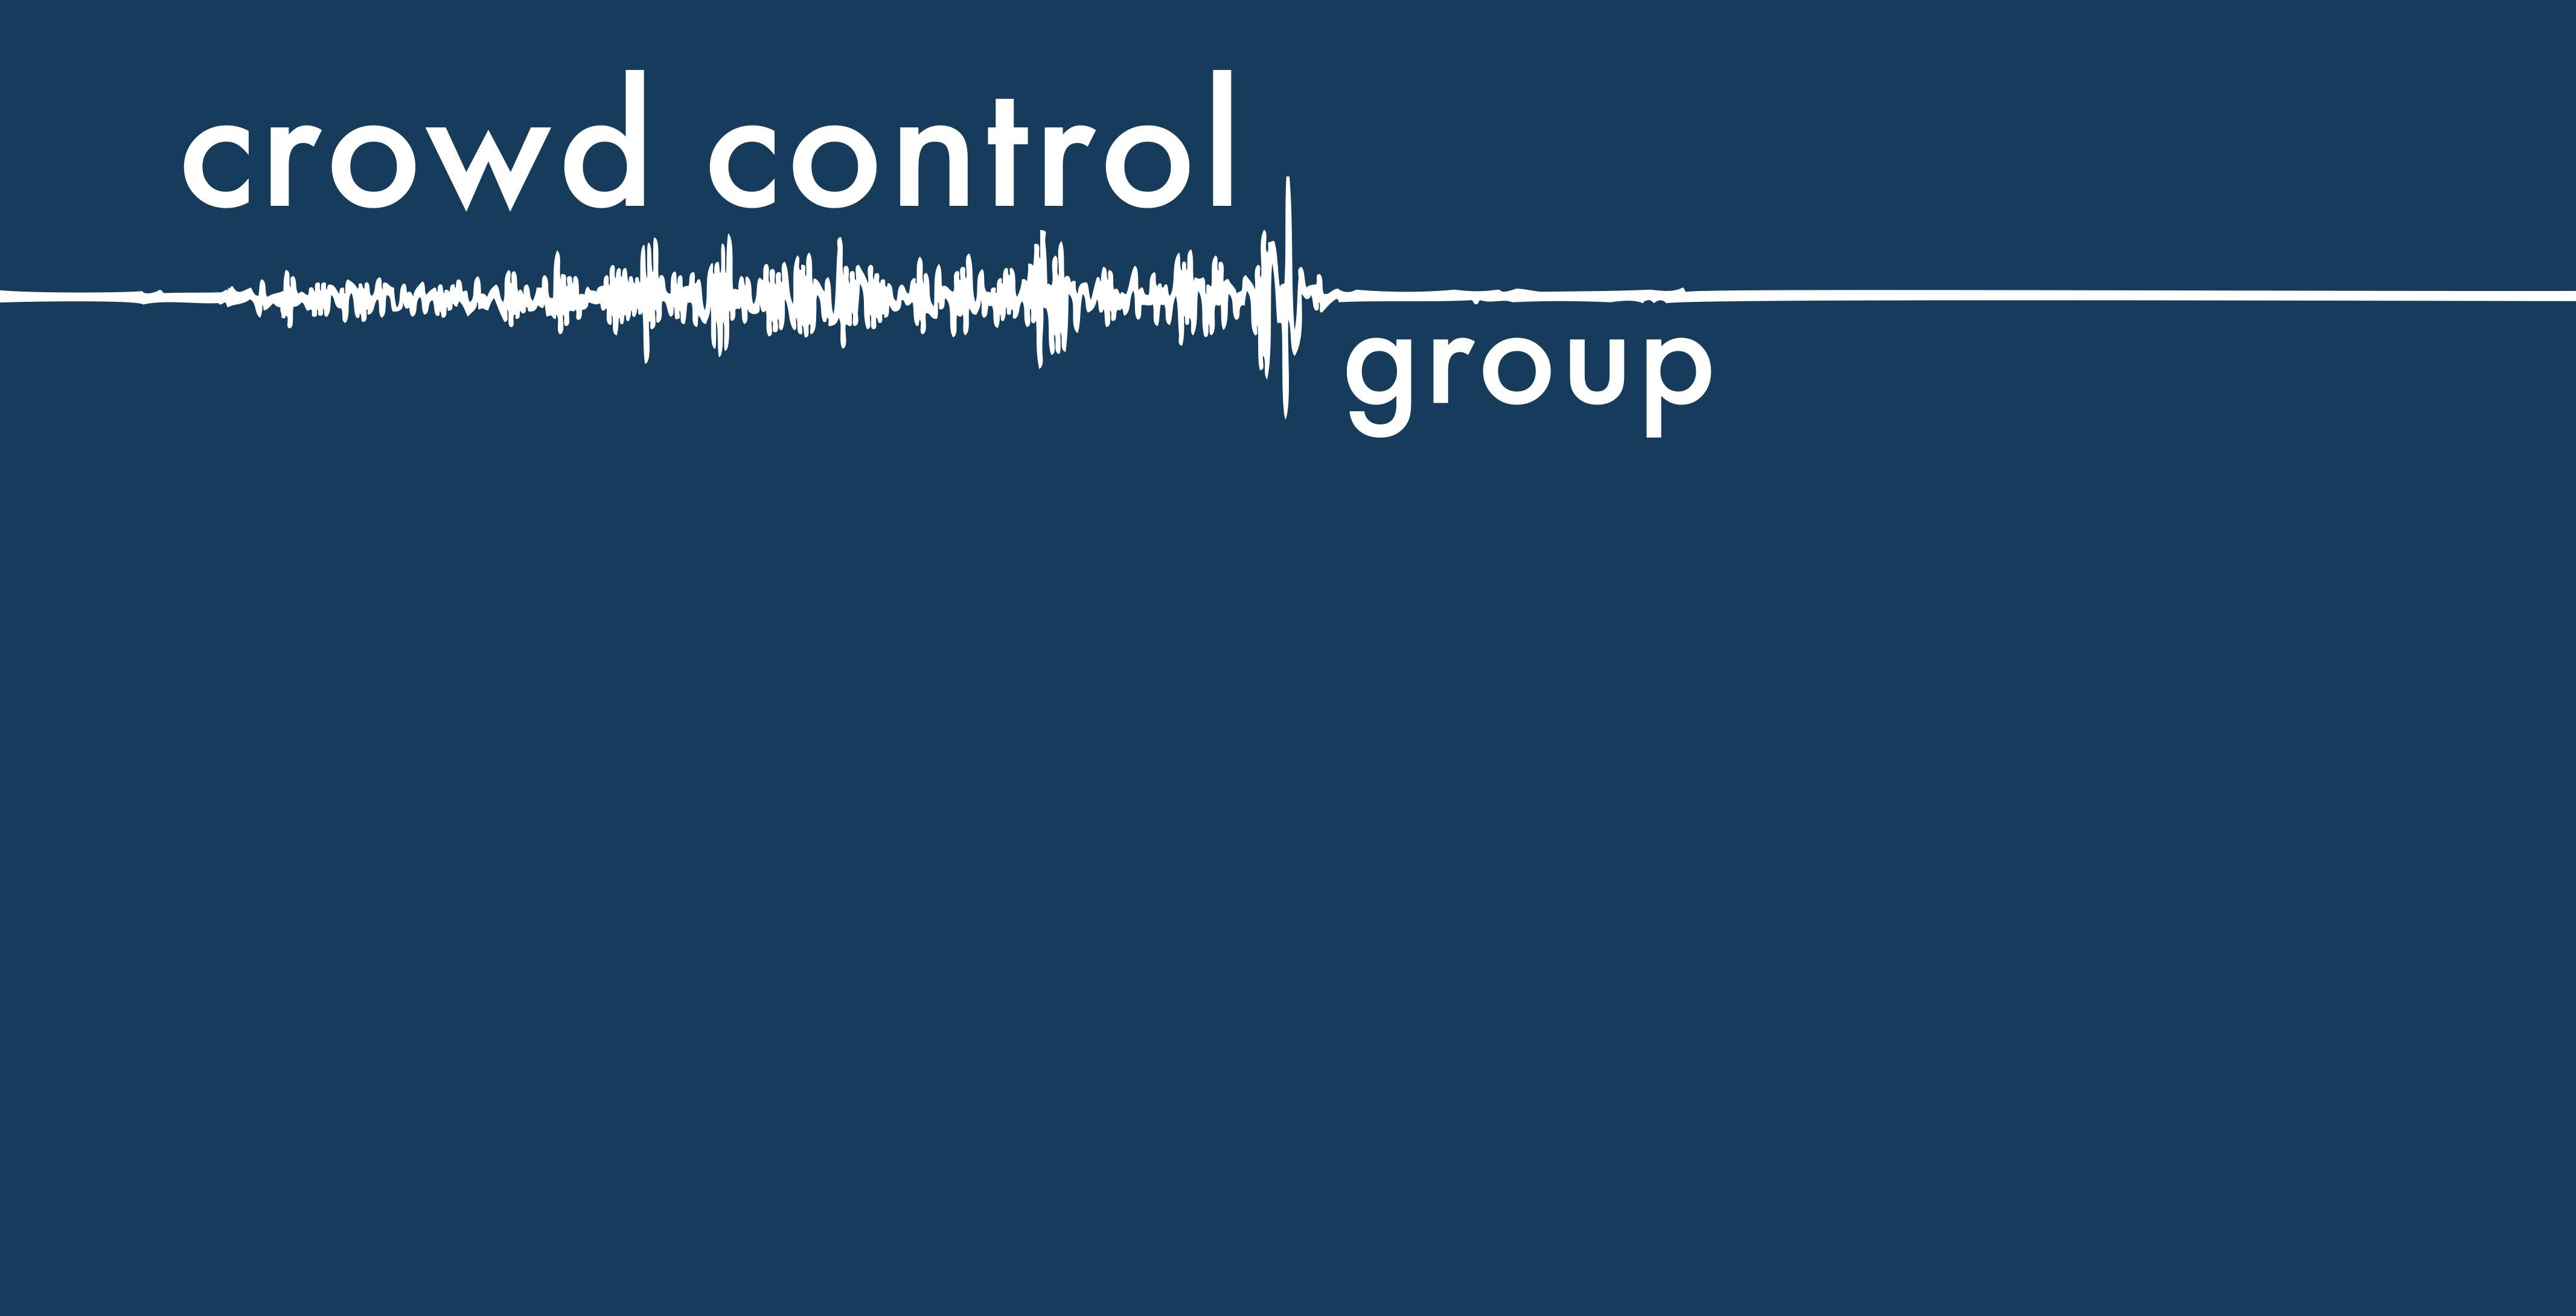 00476-CrowdControl-34x70_V3-PROOF